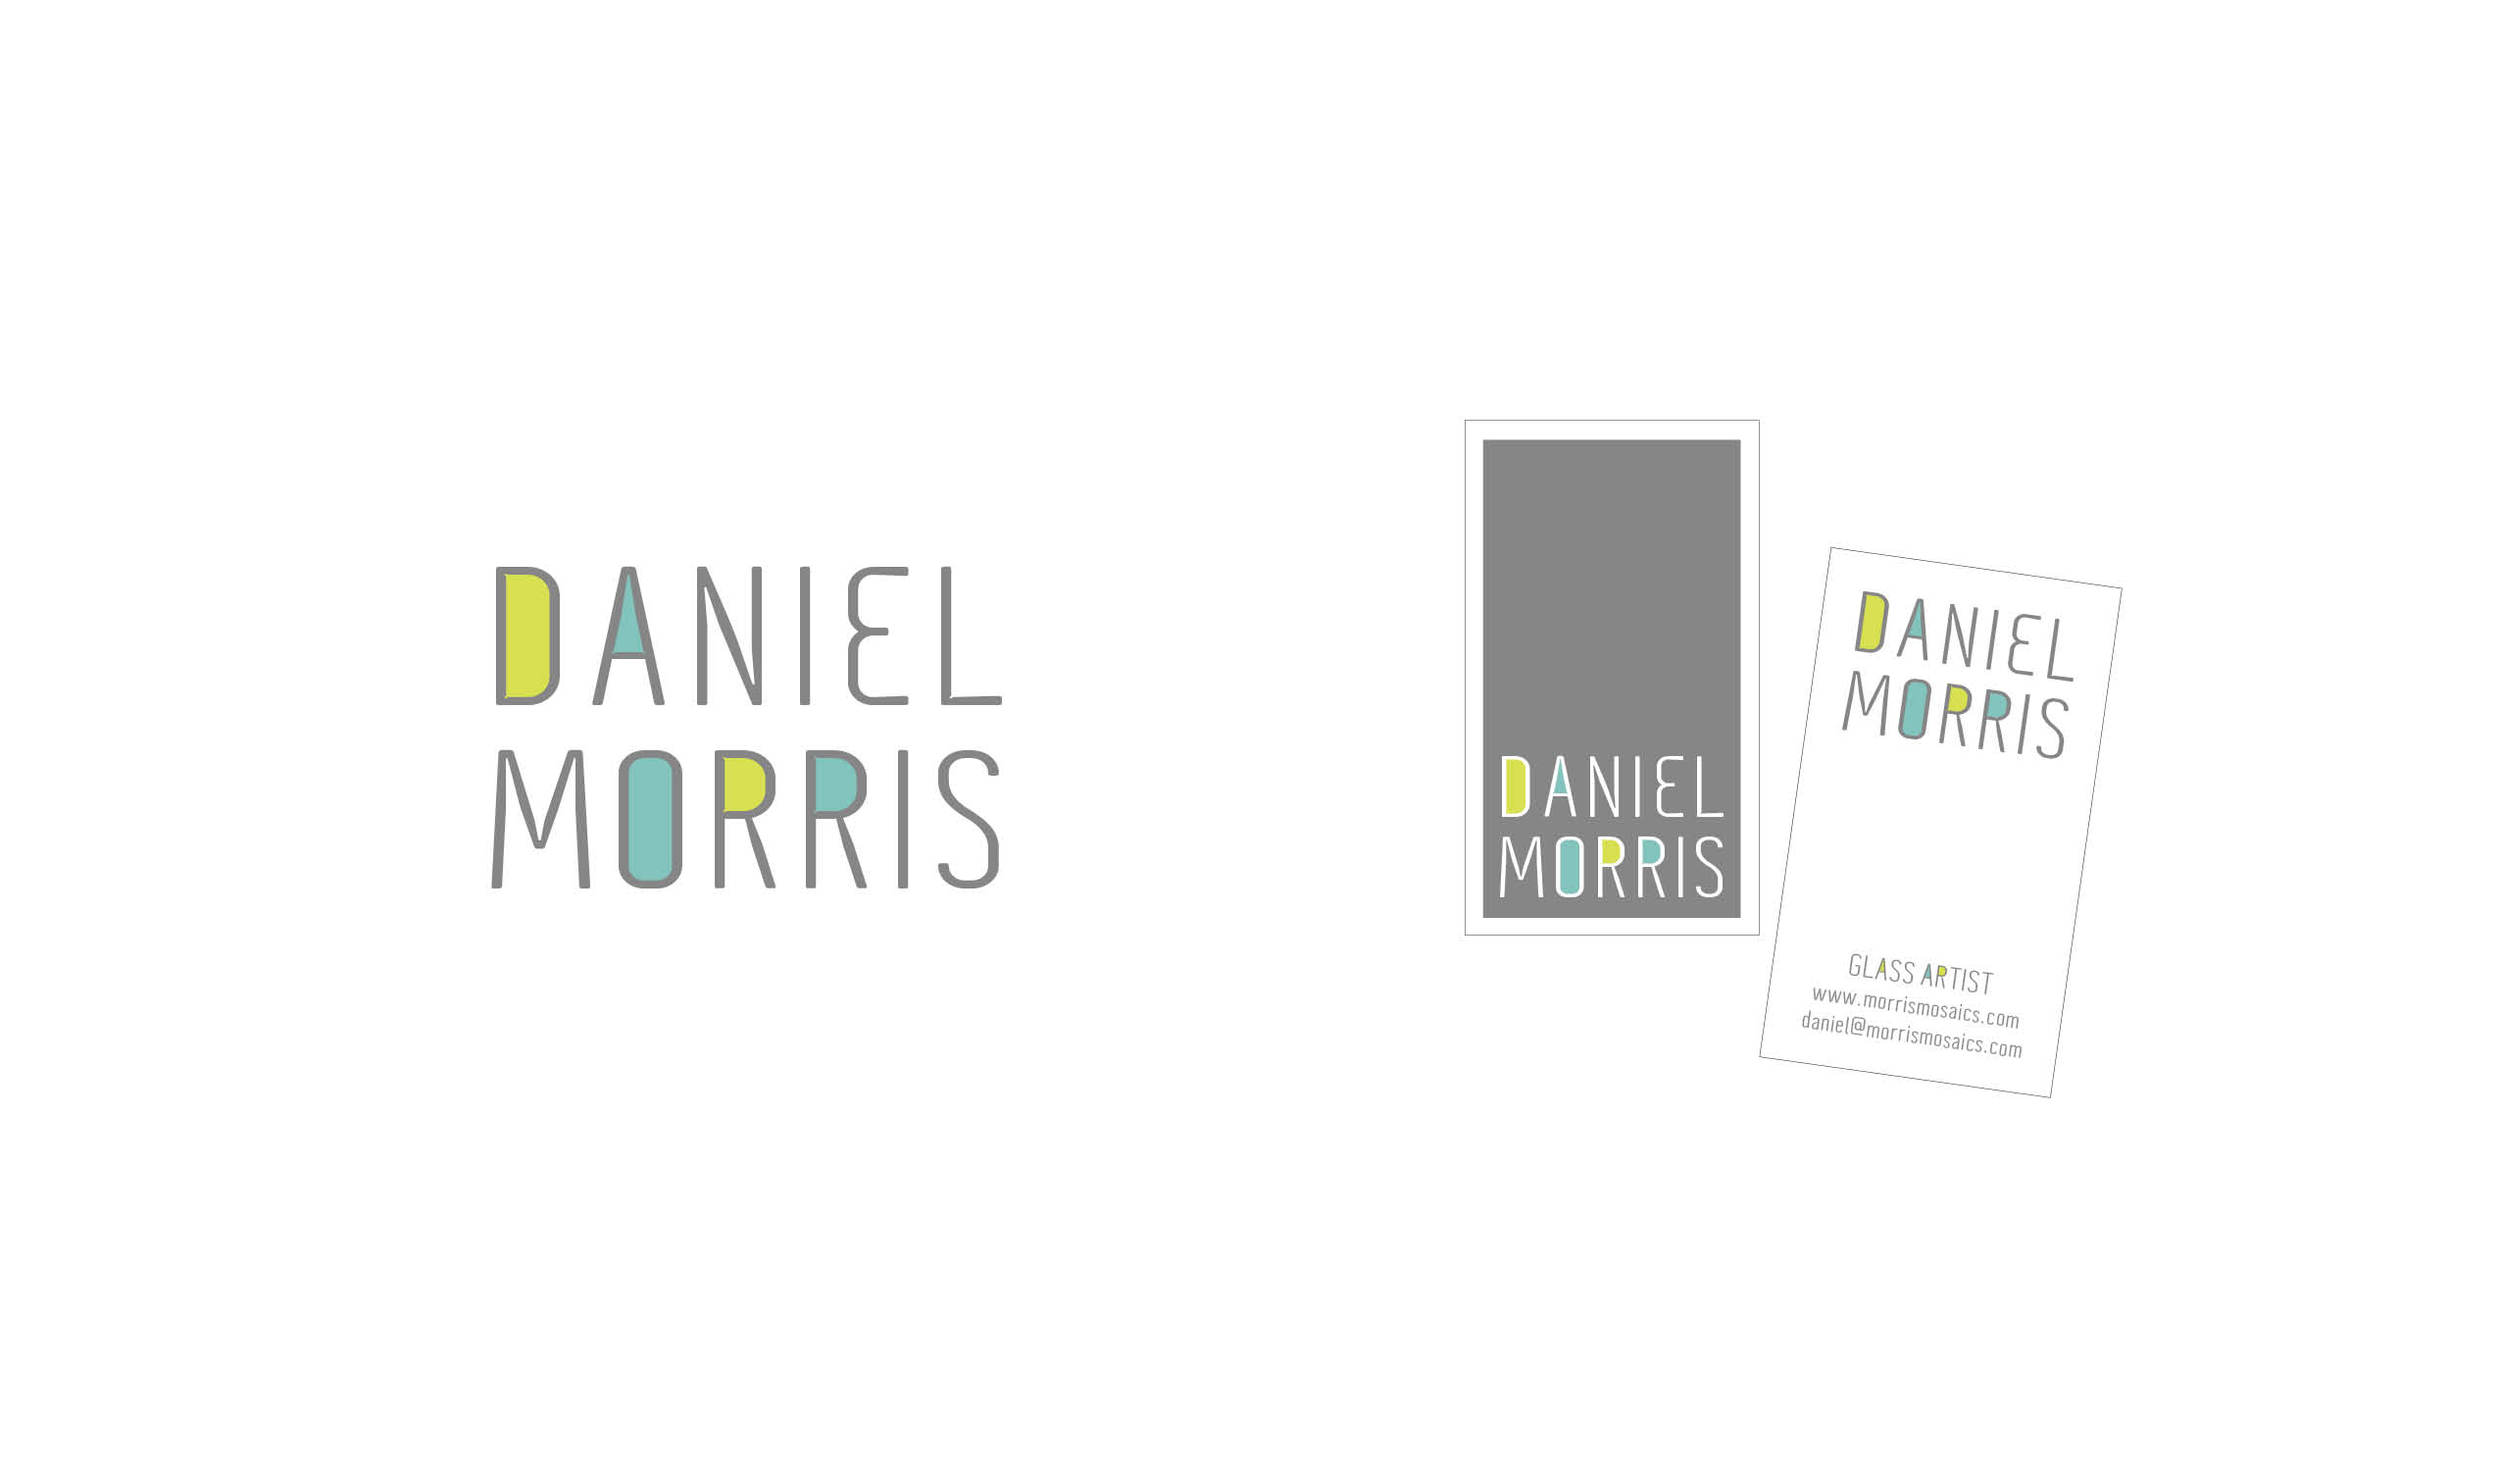 Daniel Morris | Mosaic artist